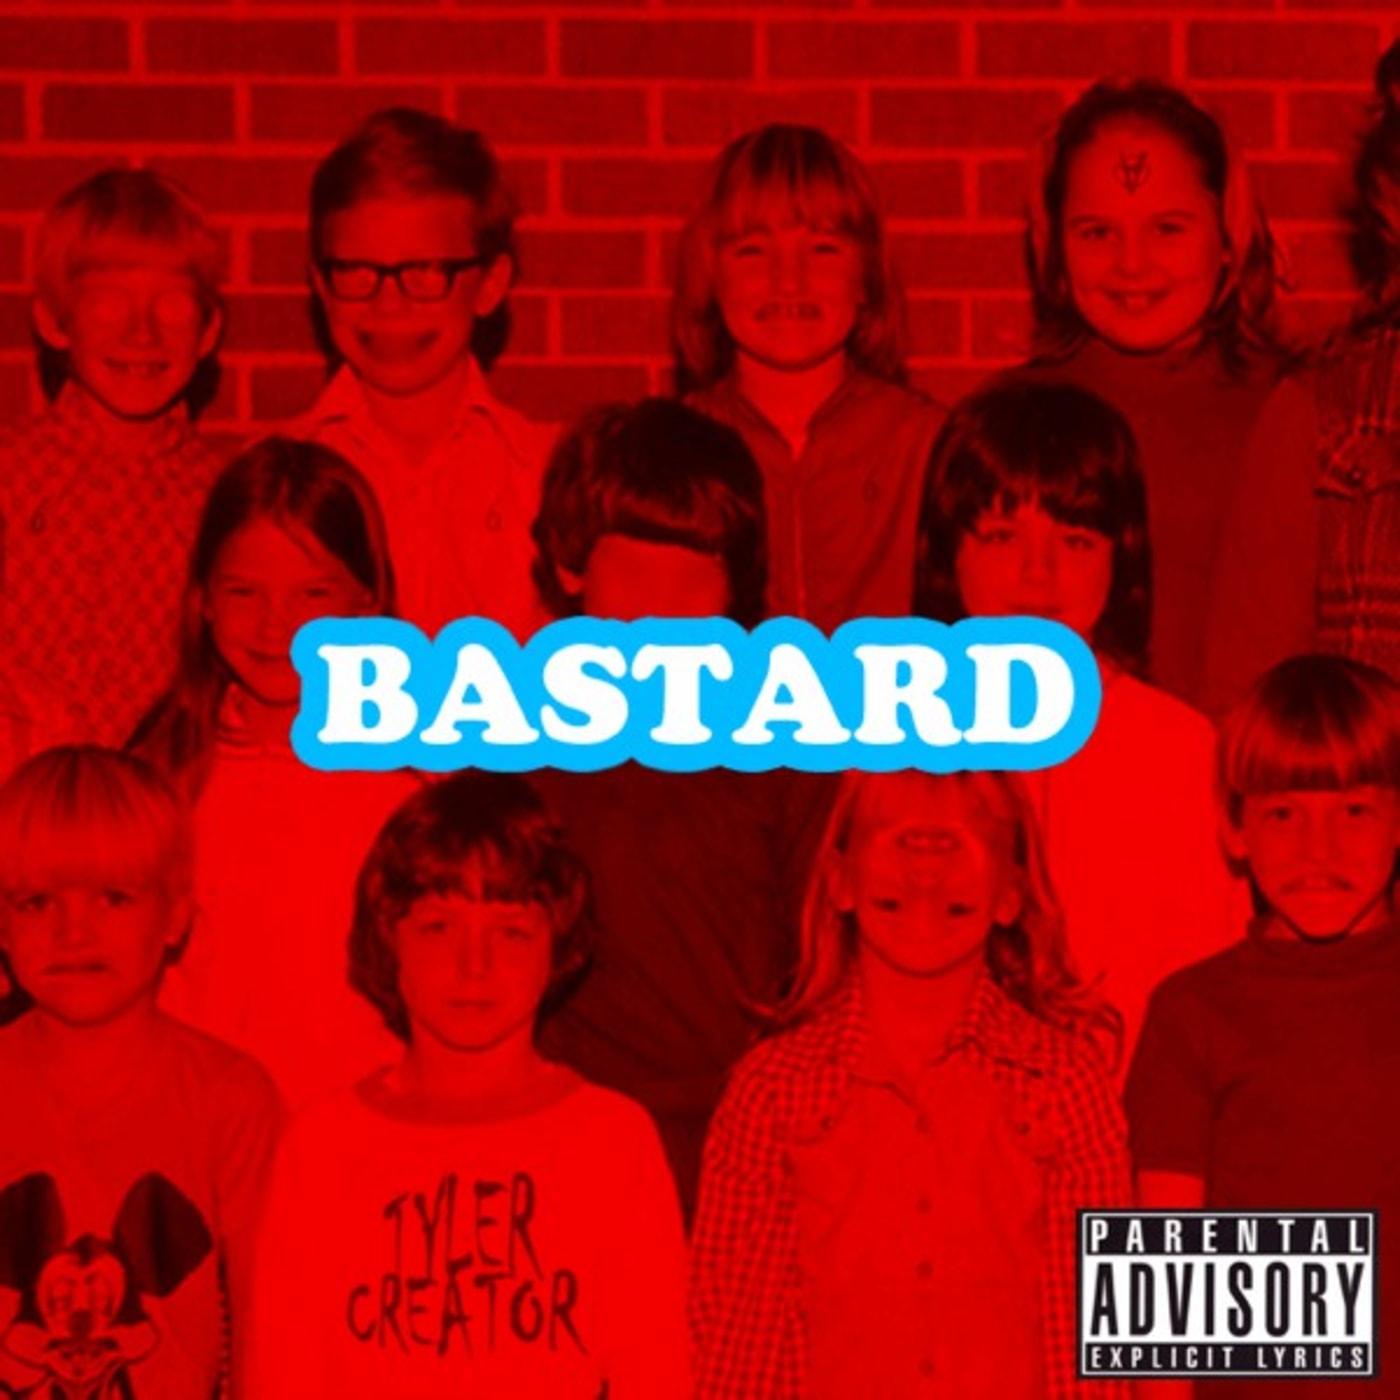 rapper mix tape tyler creator bastard